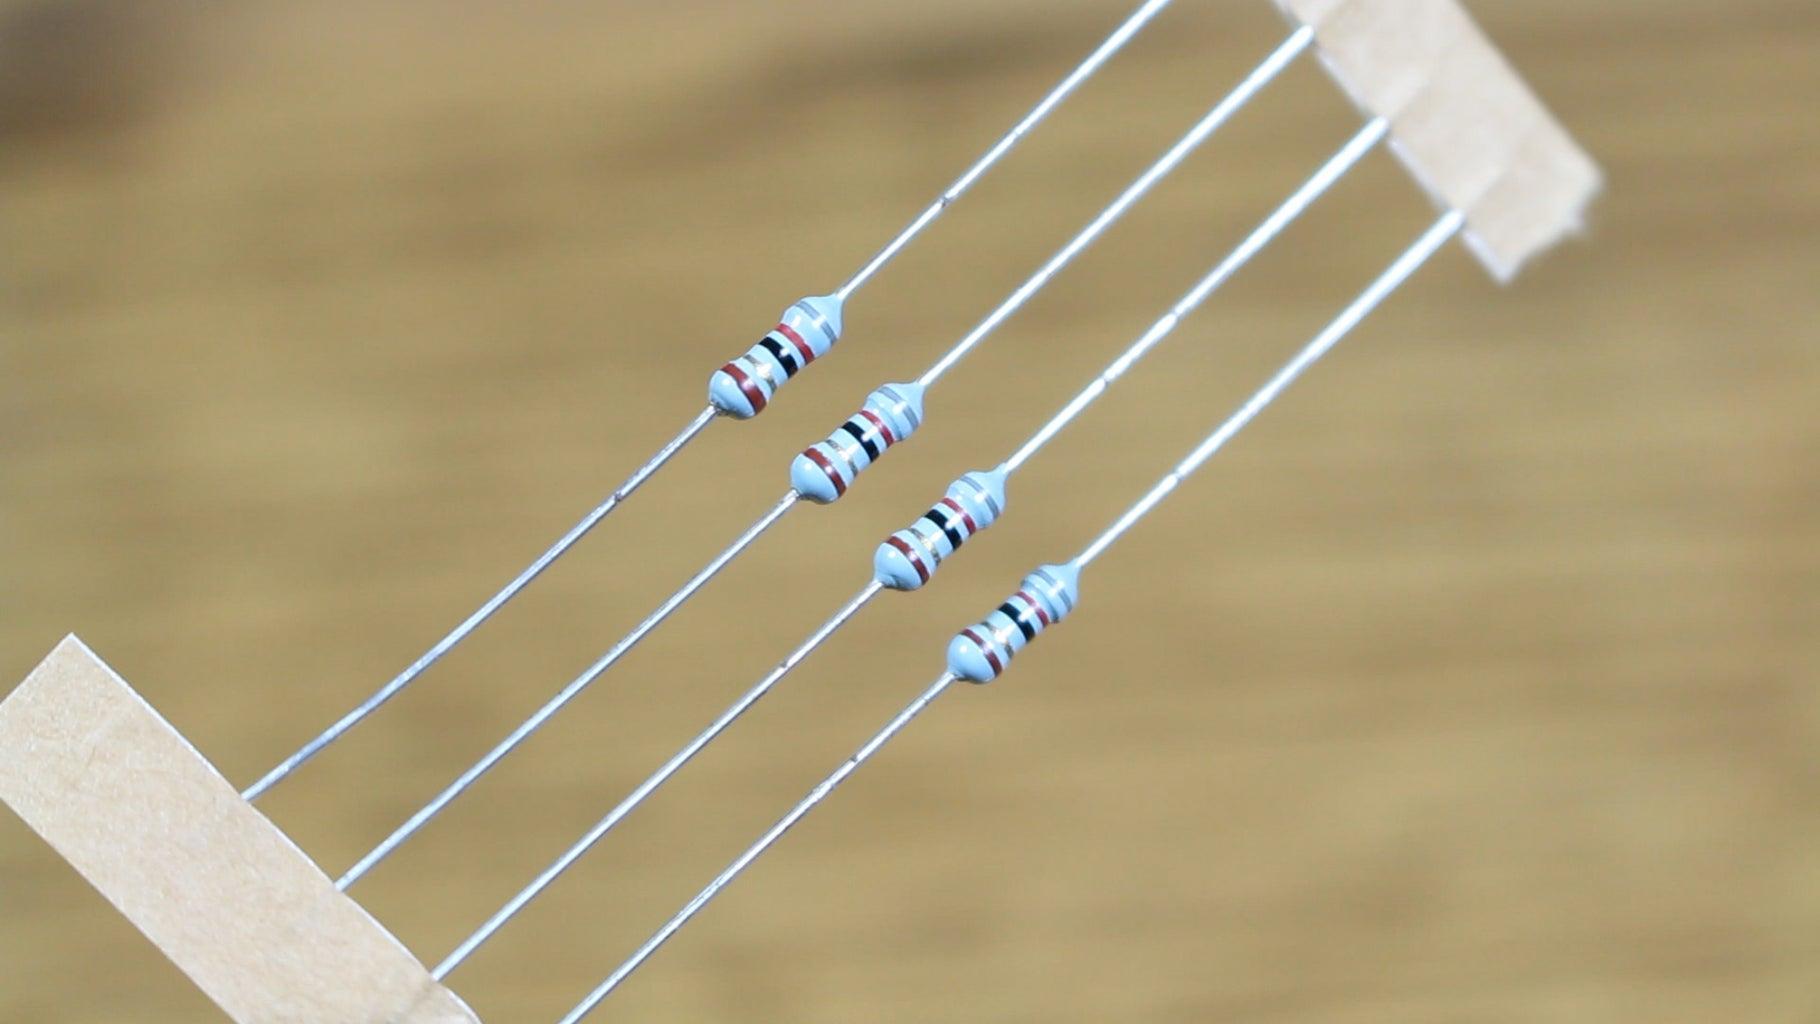 Determining the Resistors